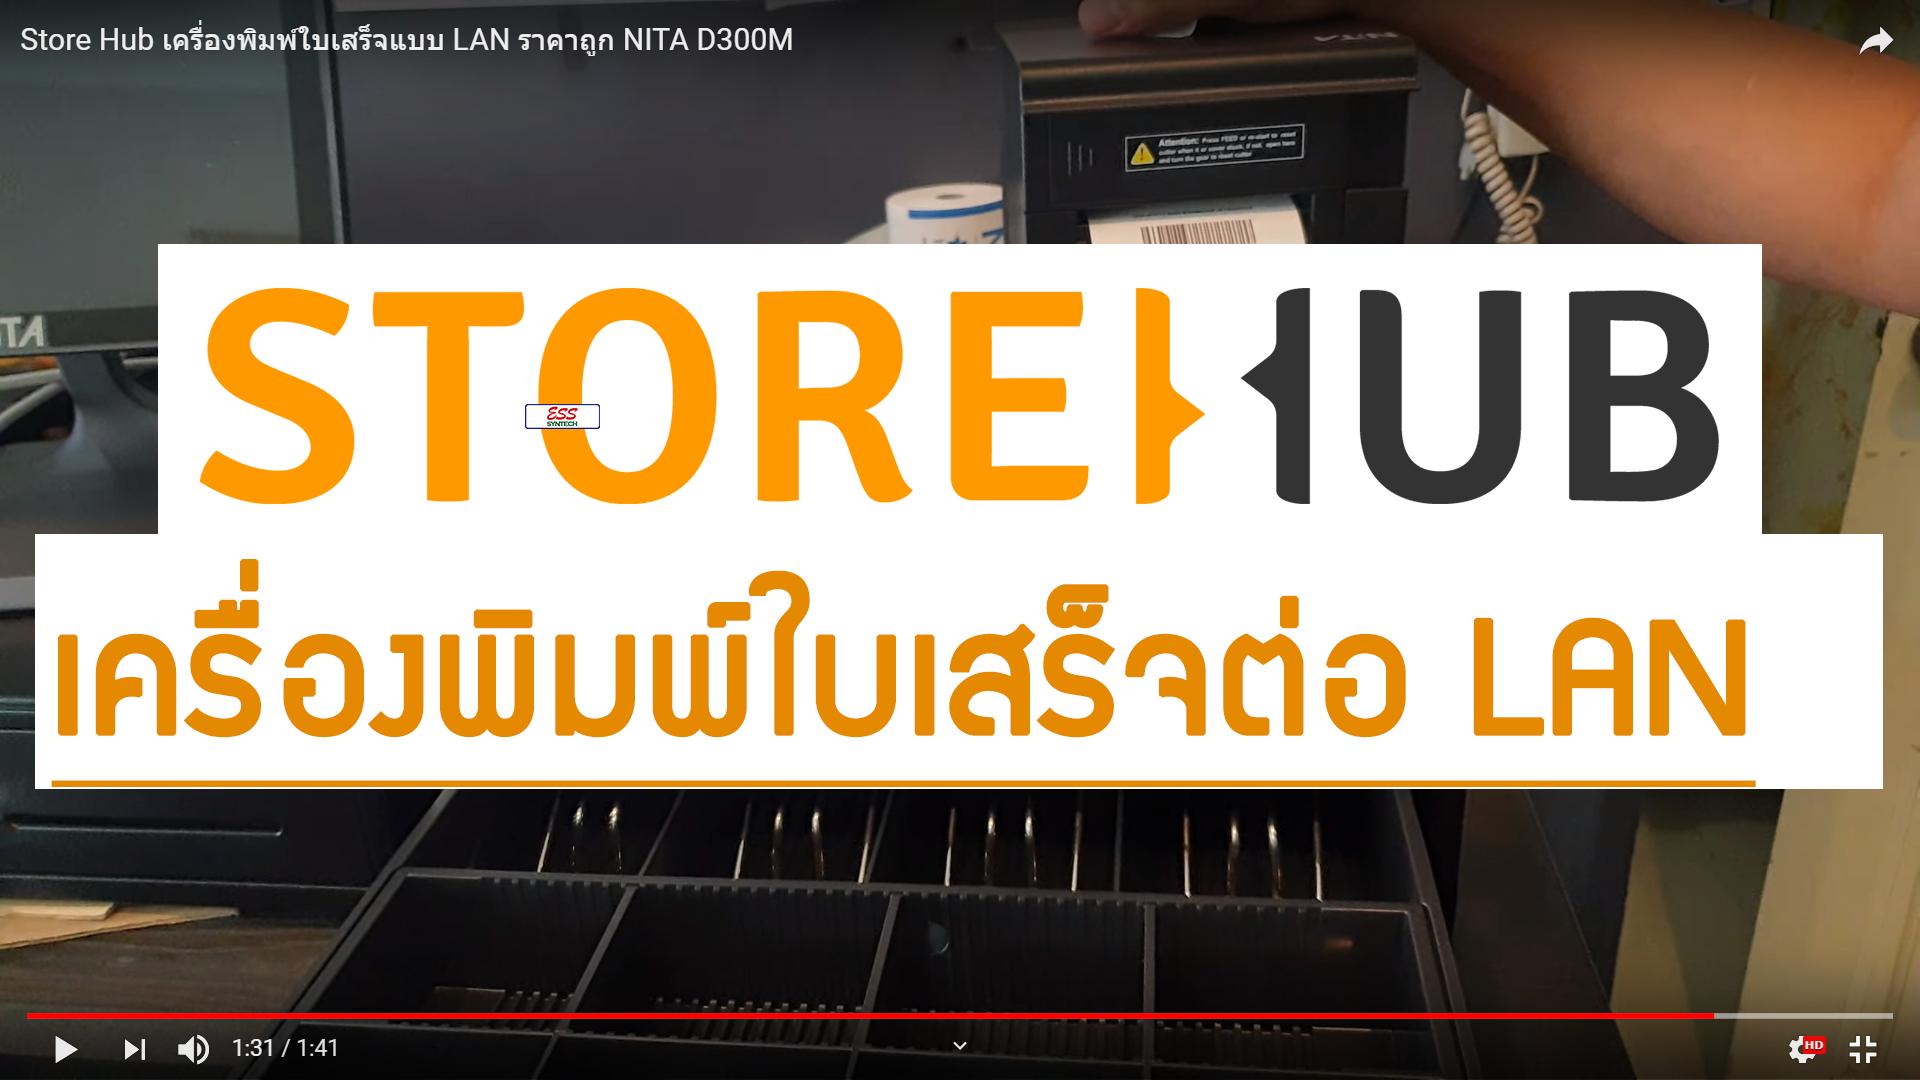 StoreHub พิมพ์ใบเสร็จจากแอป Store Hub ด้วยเครื่องพิมพ์ใบเสร็จ Epson รุ่น TM-m30 ผ่าน iPad ต่อบลูทูช หน้ากว้างขนาด 3 นิ้ว ไม่ใช้หมึก NITA D300M